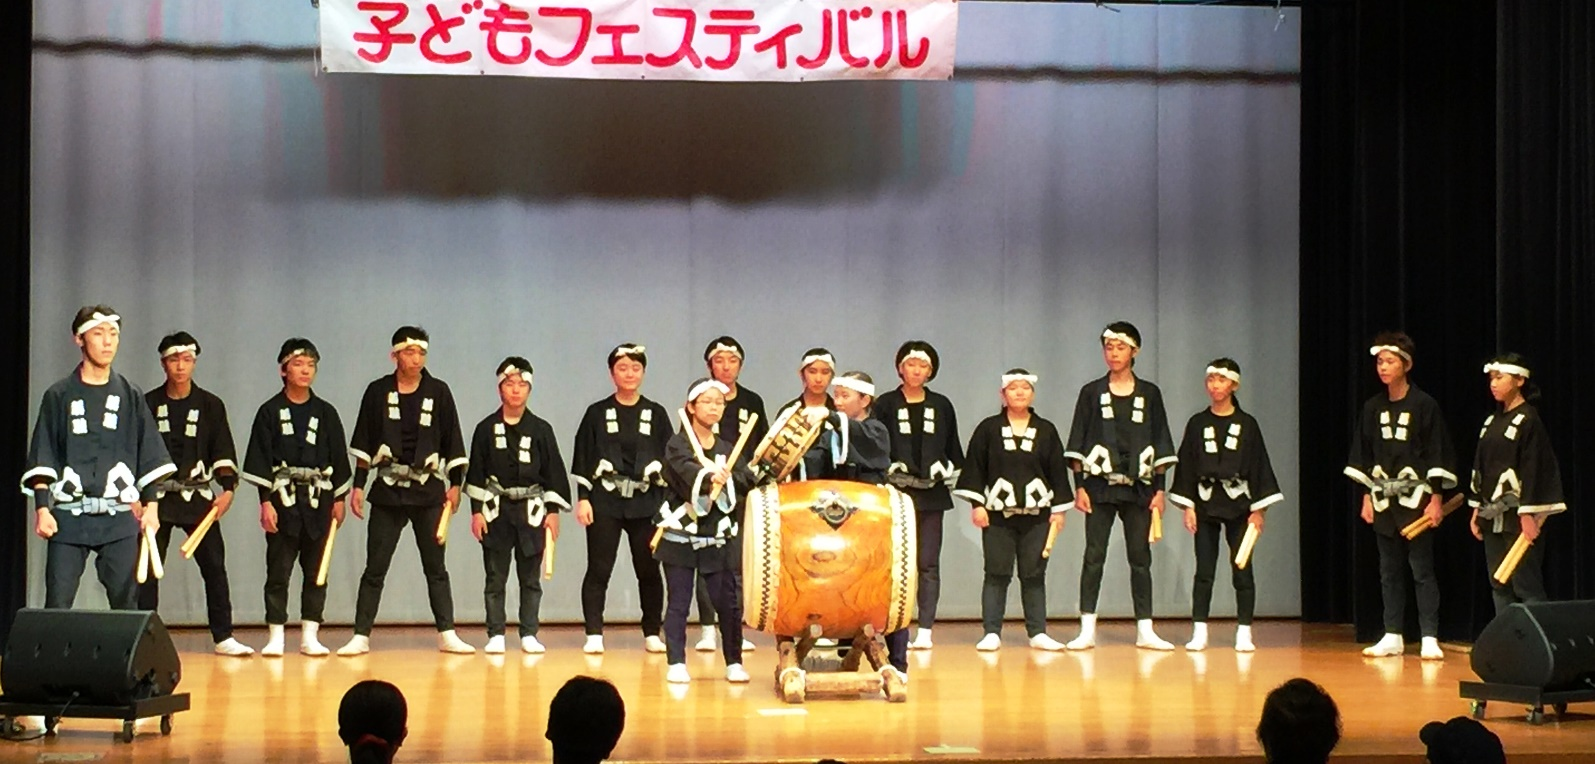 20150913jiyunopmori3510